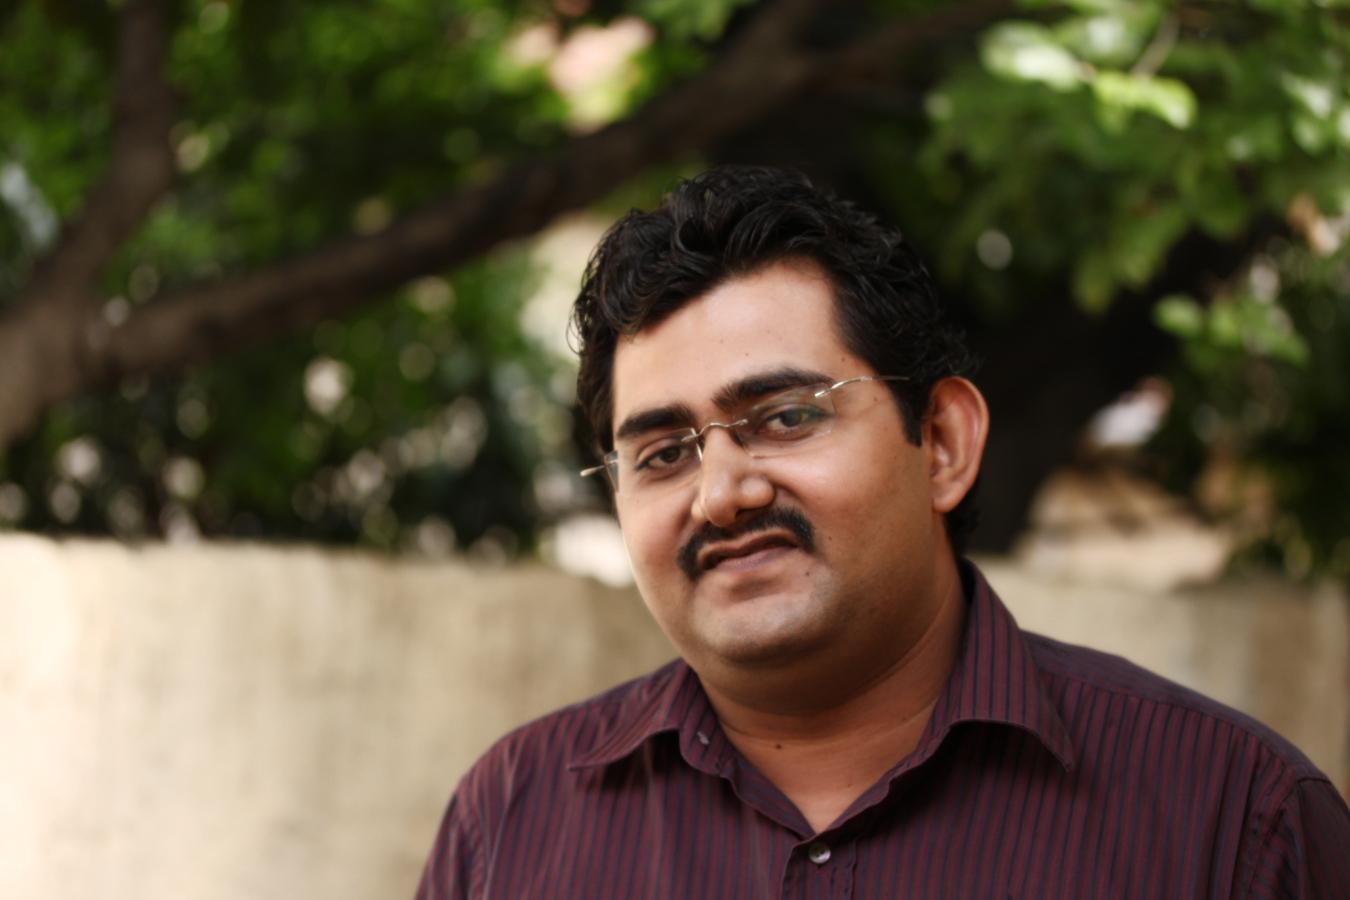 Dhaval Trivedi